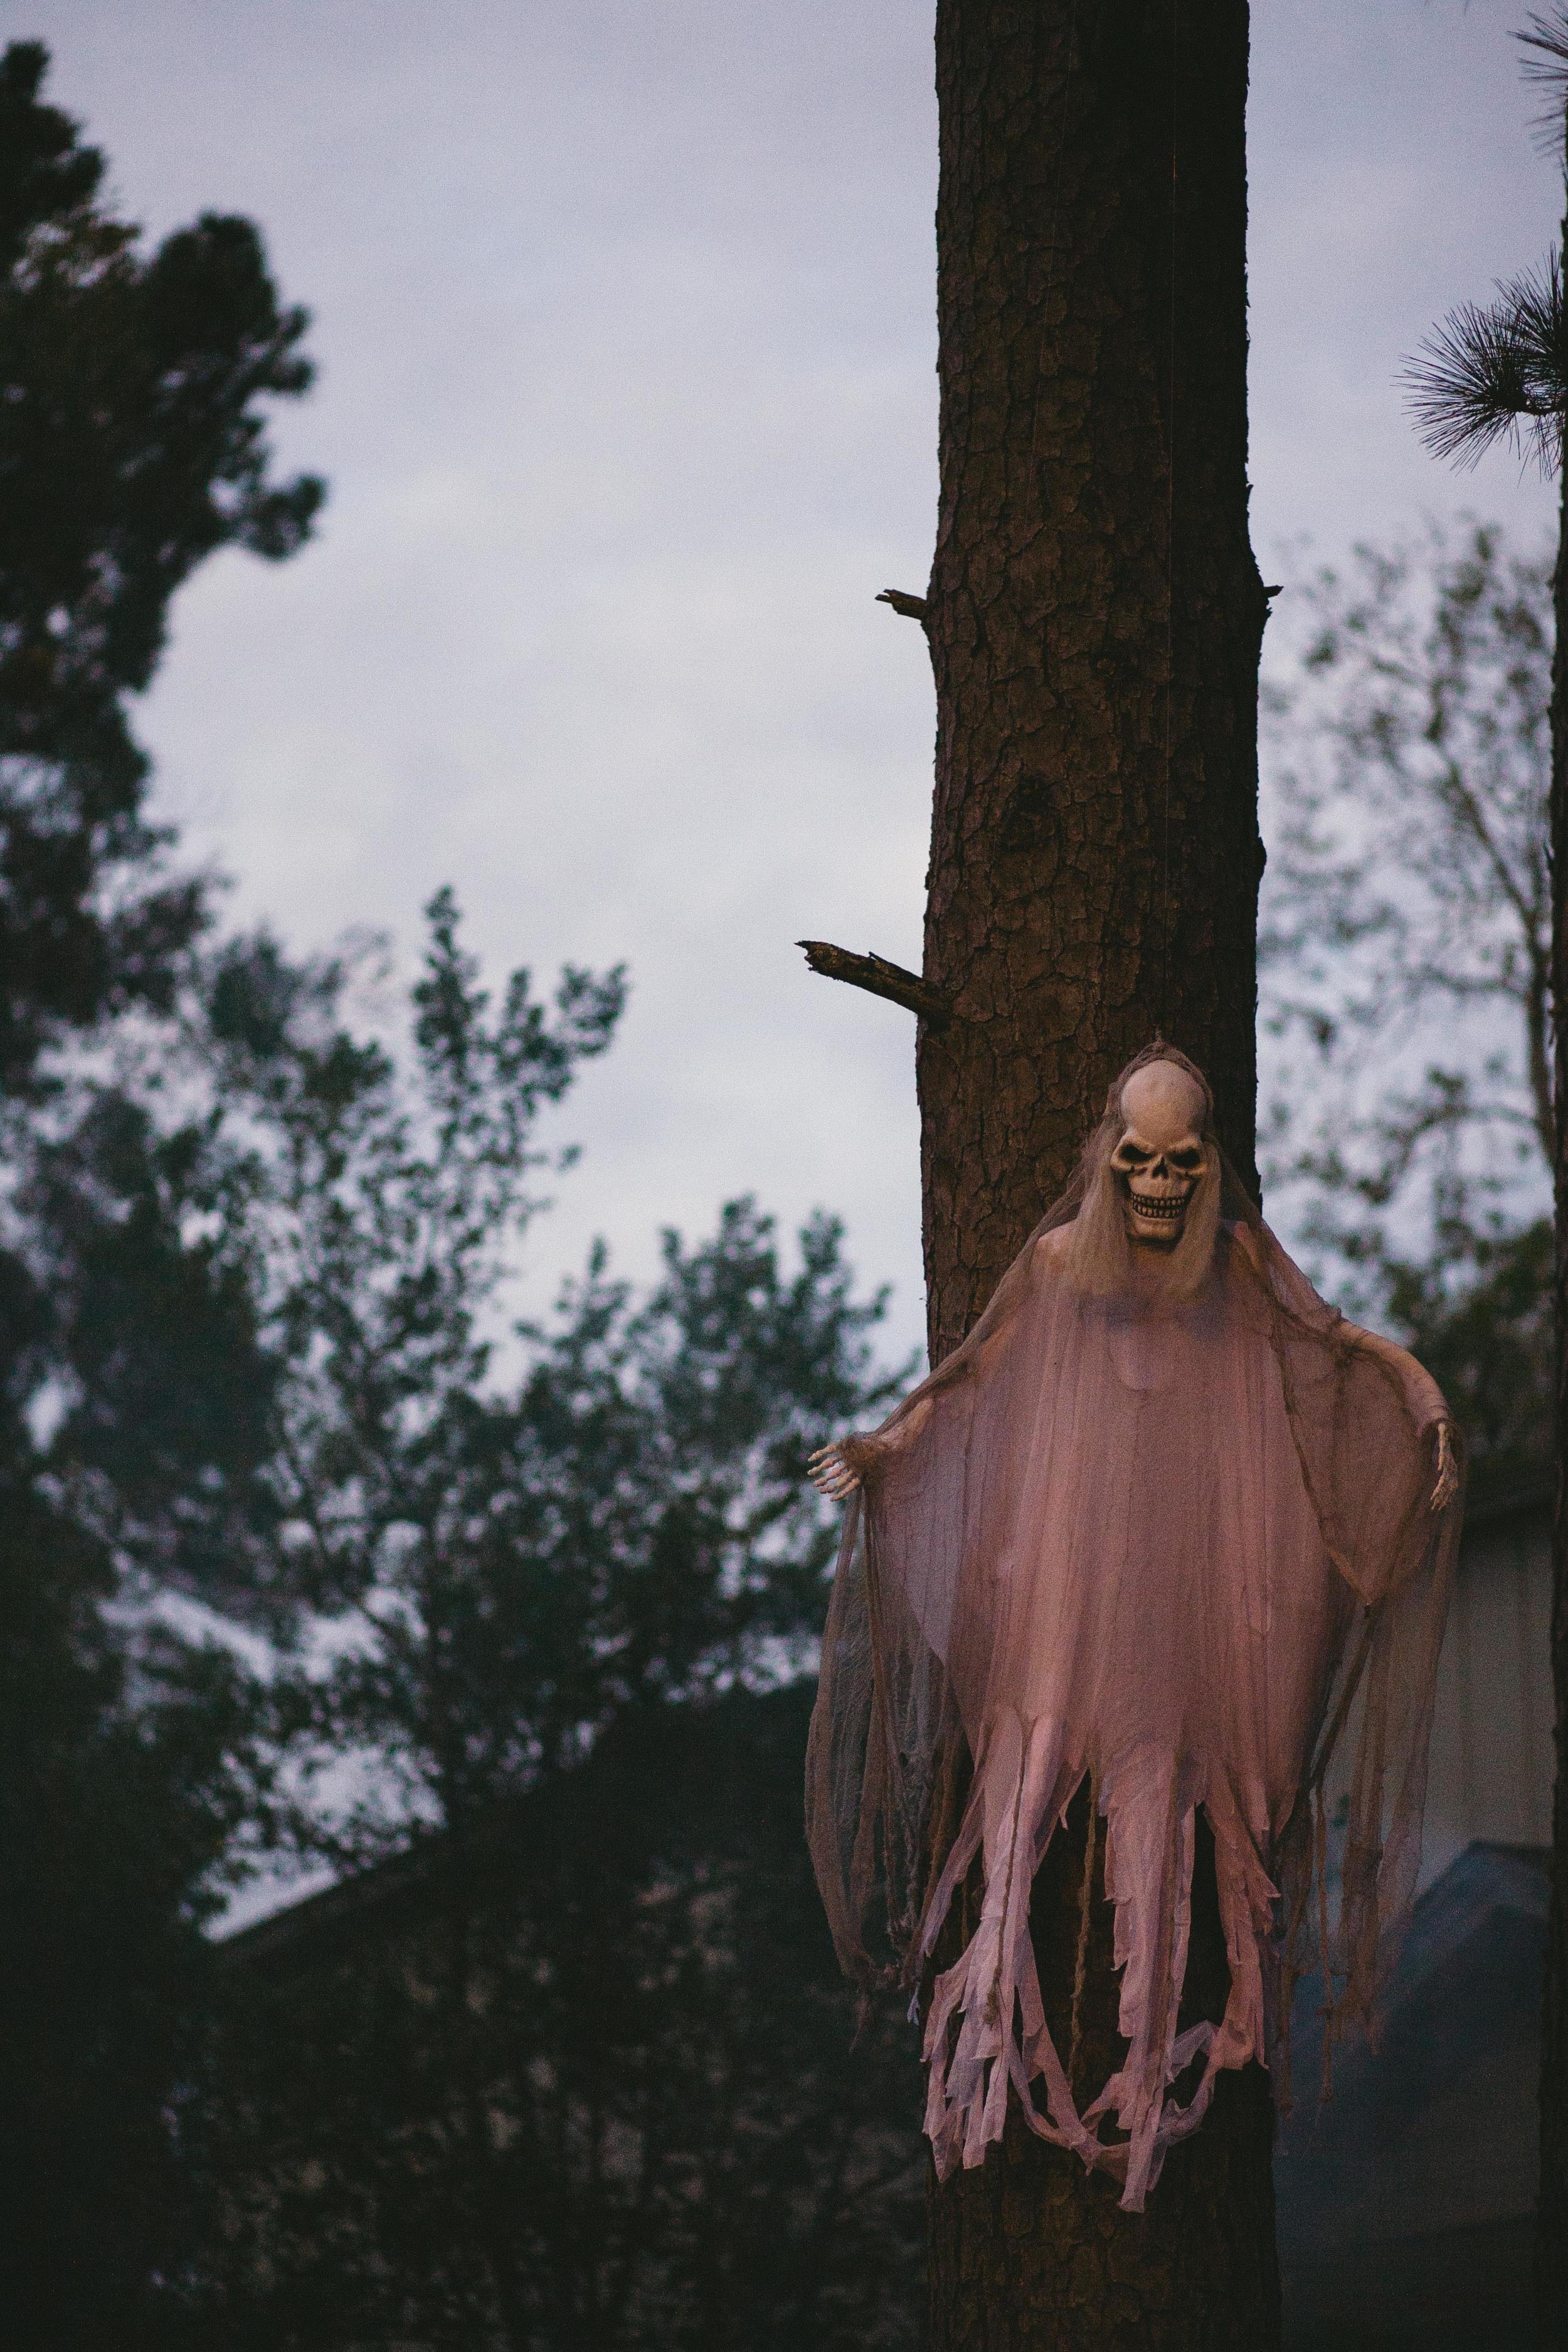 tallahassee-photography-halloween-8826.jpg